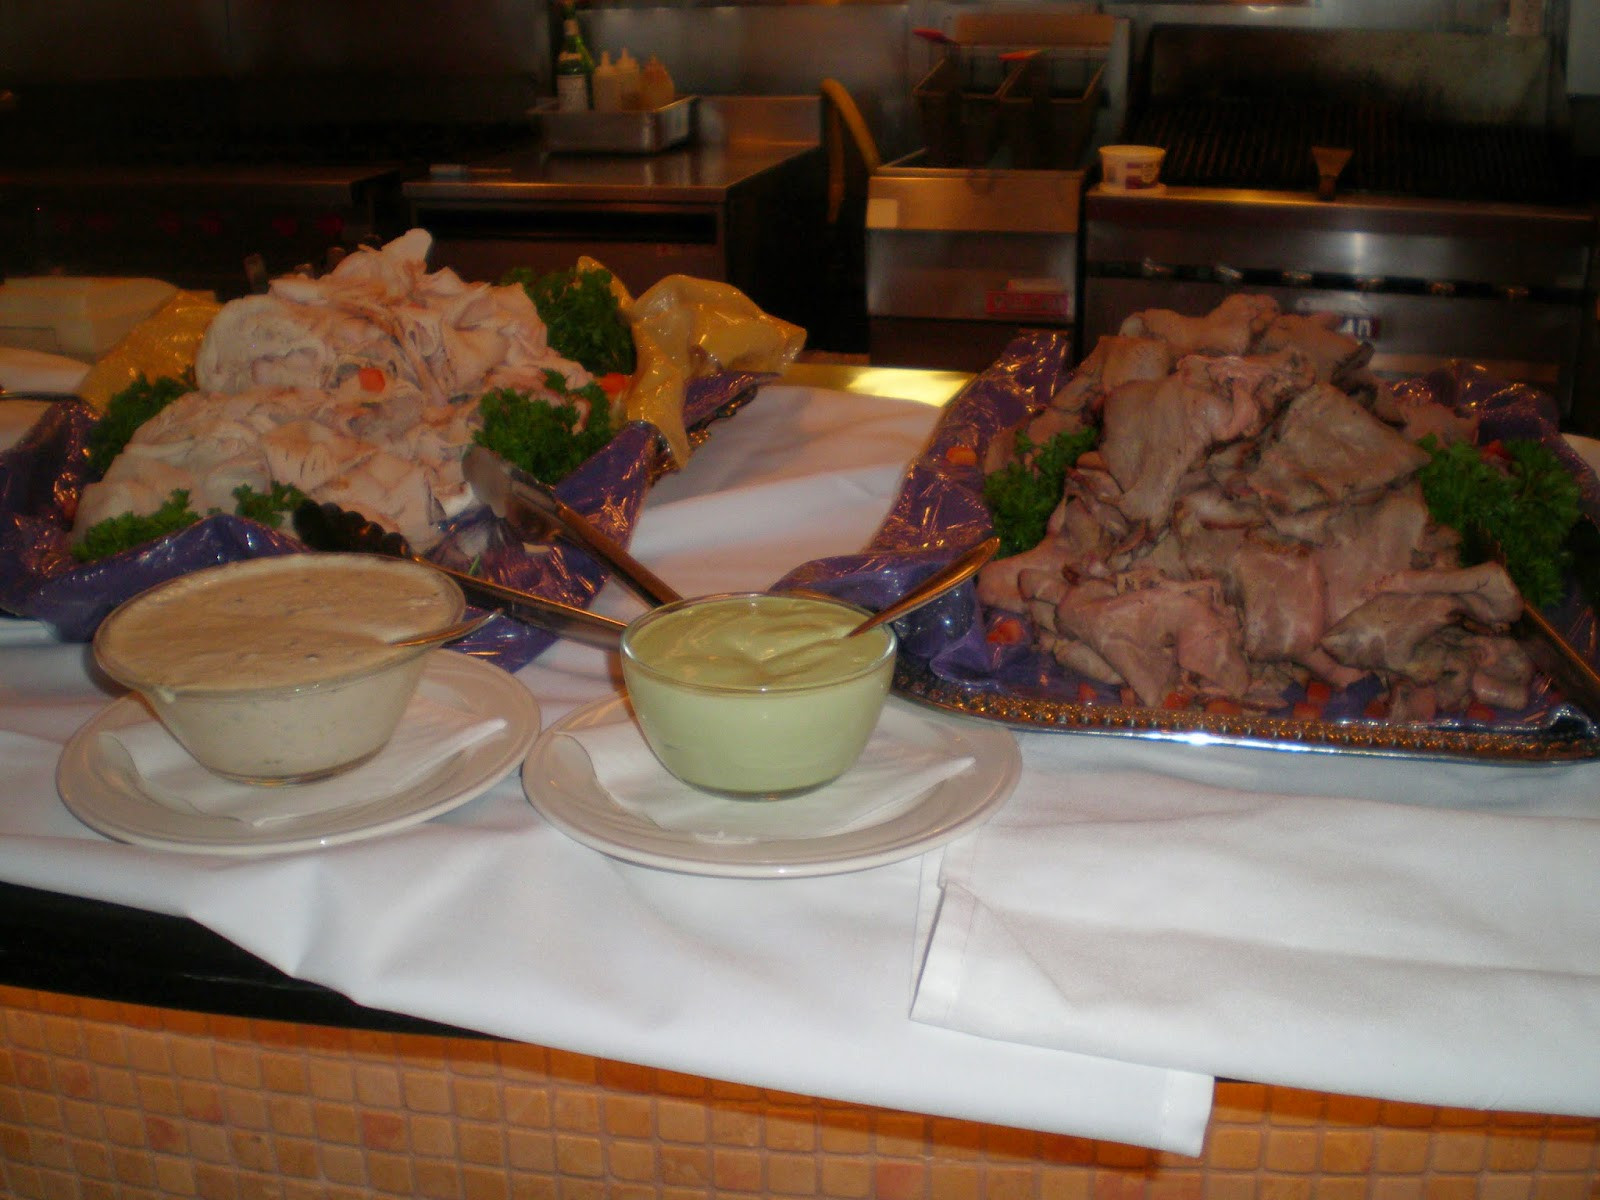 Restaurants Serving Easter Dinner  Restaurant Success Tips Easter Brunch Dinner Menu Ideas